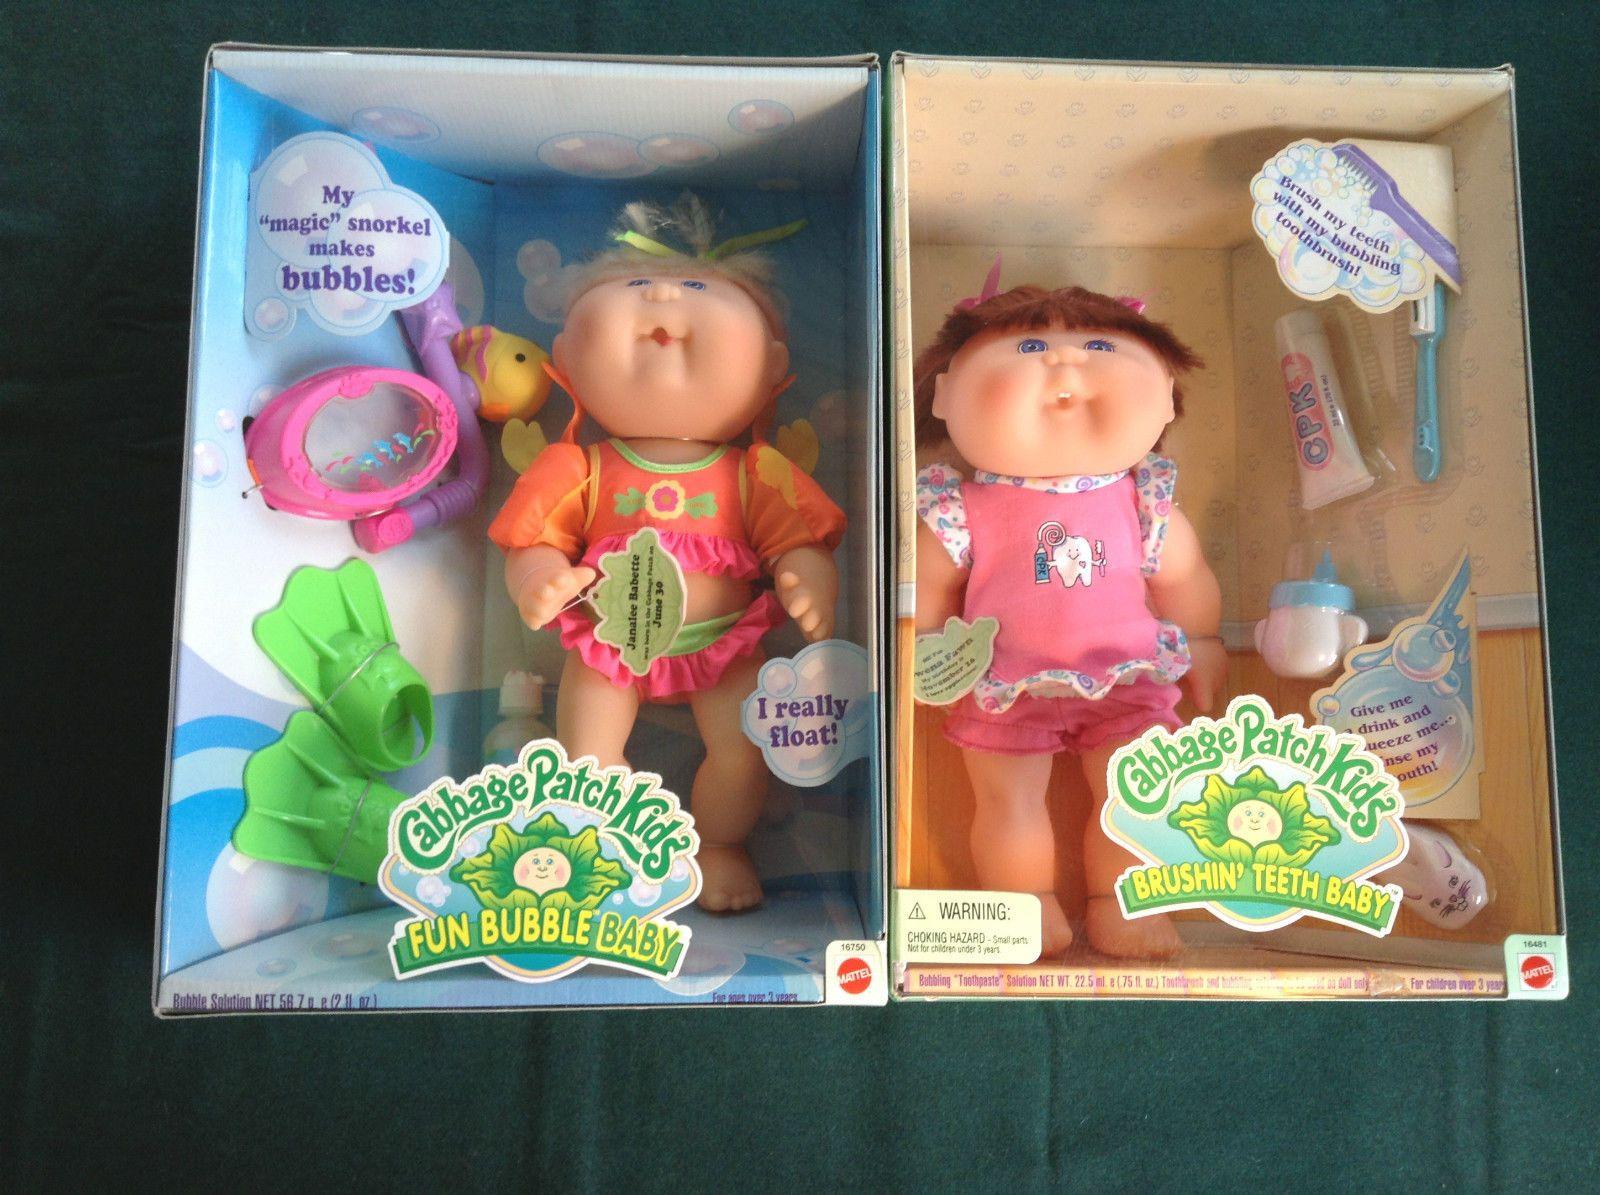 1997 Cabbage Patch Fun Bubble Baby Brushin Teeth Vinyl Bott Funko Pop Doraemon Full Body Dolls